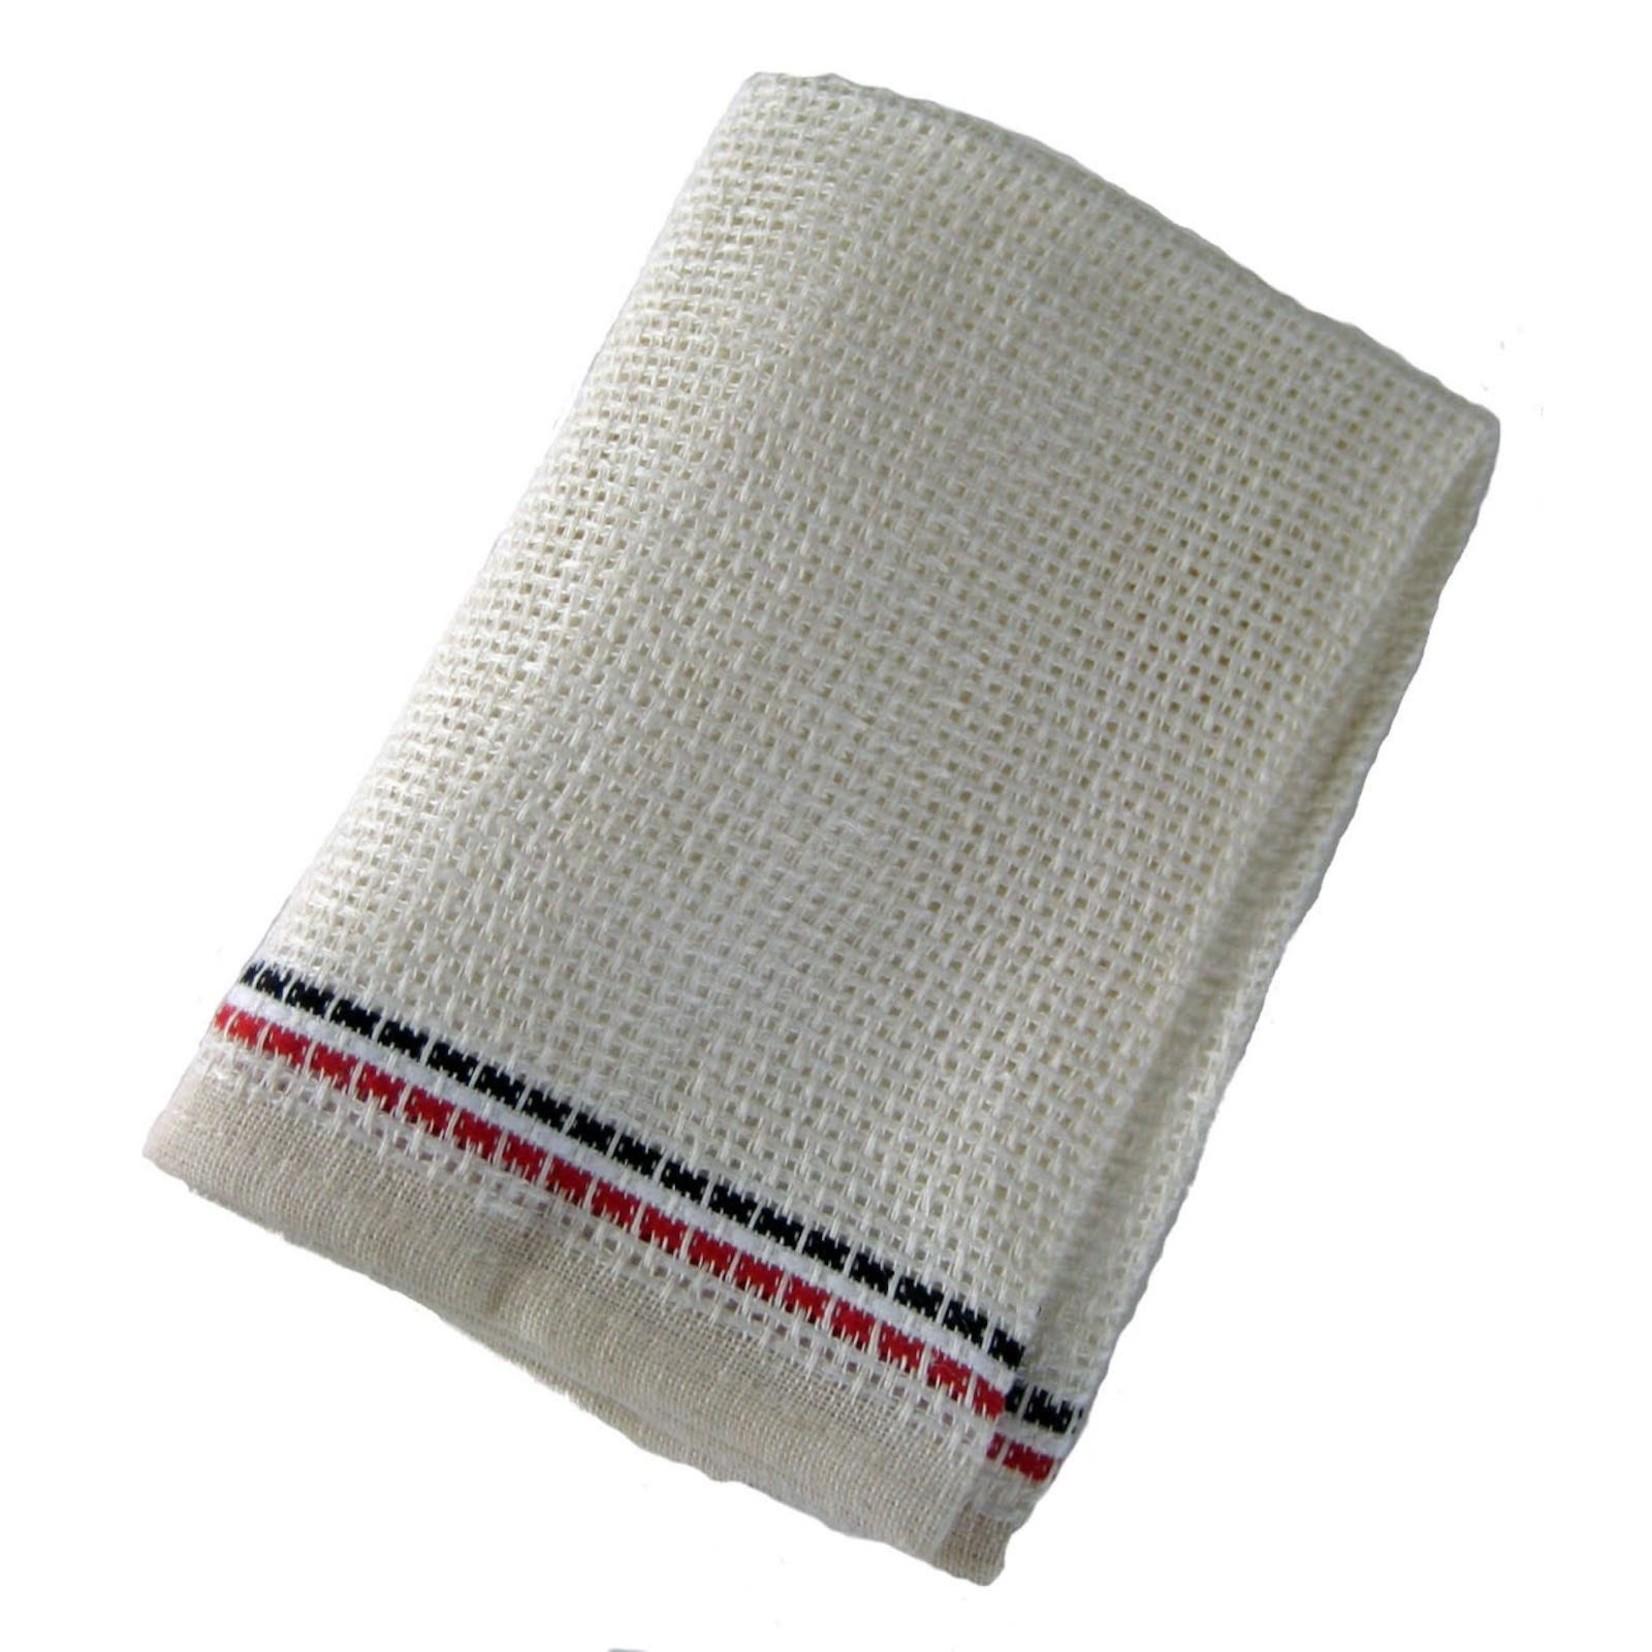 Classic Linen Dishcloth